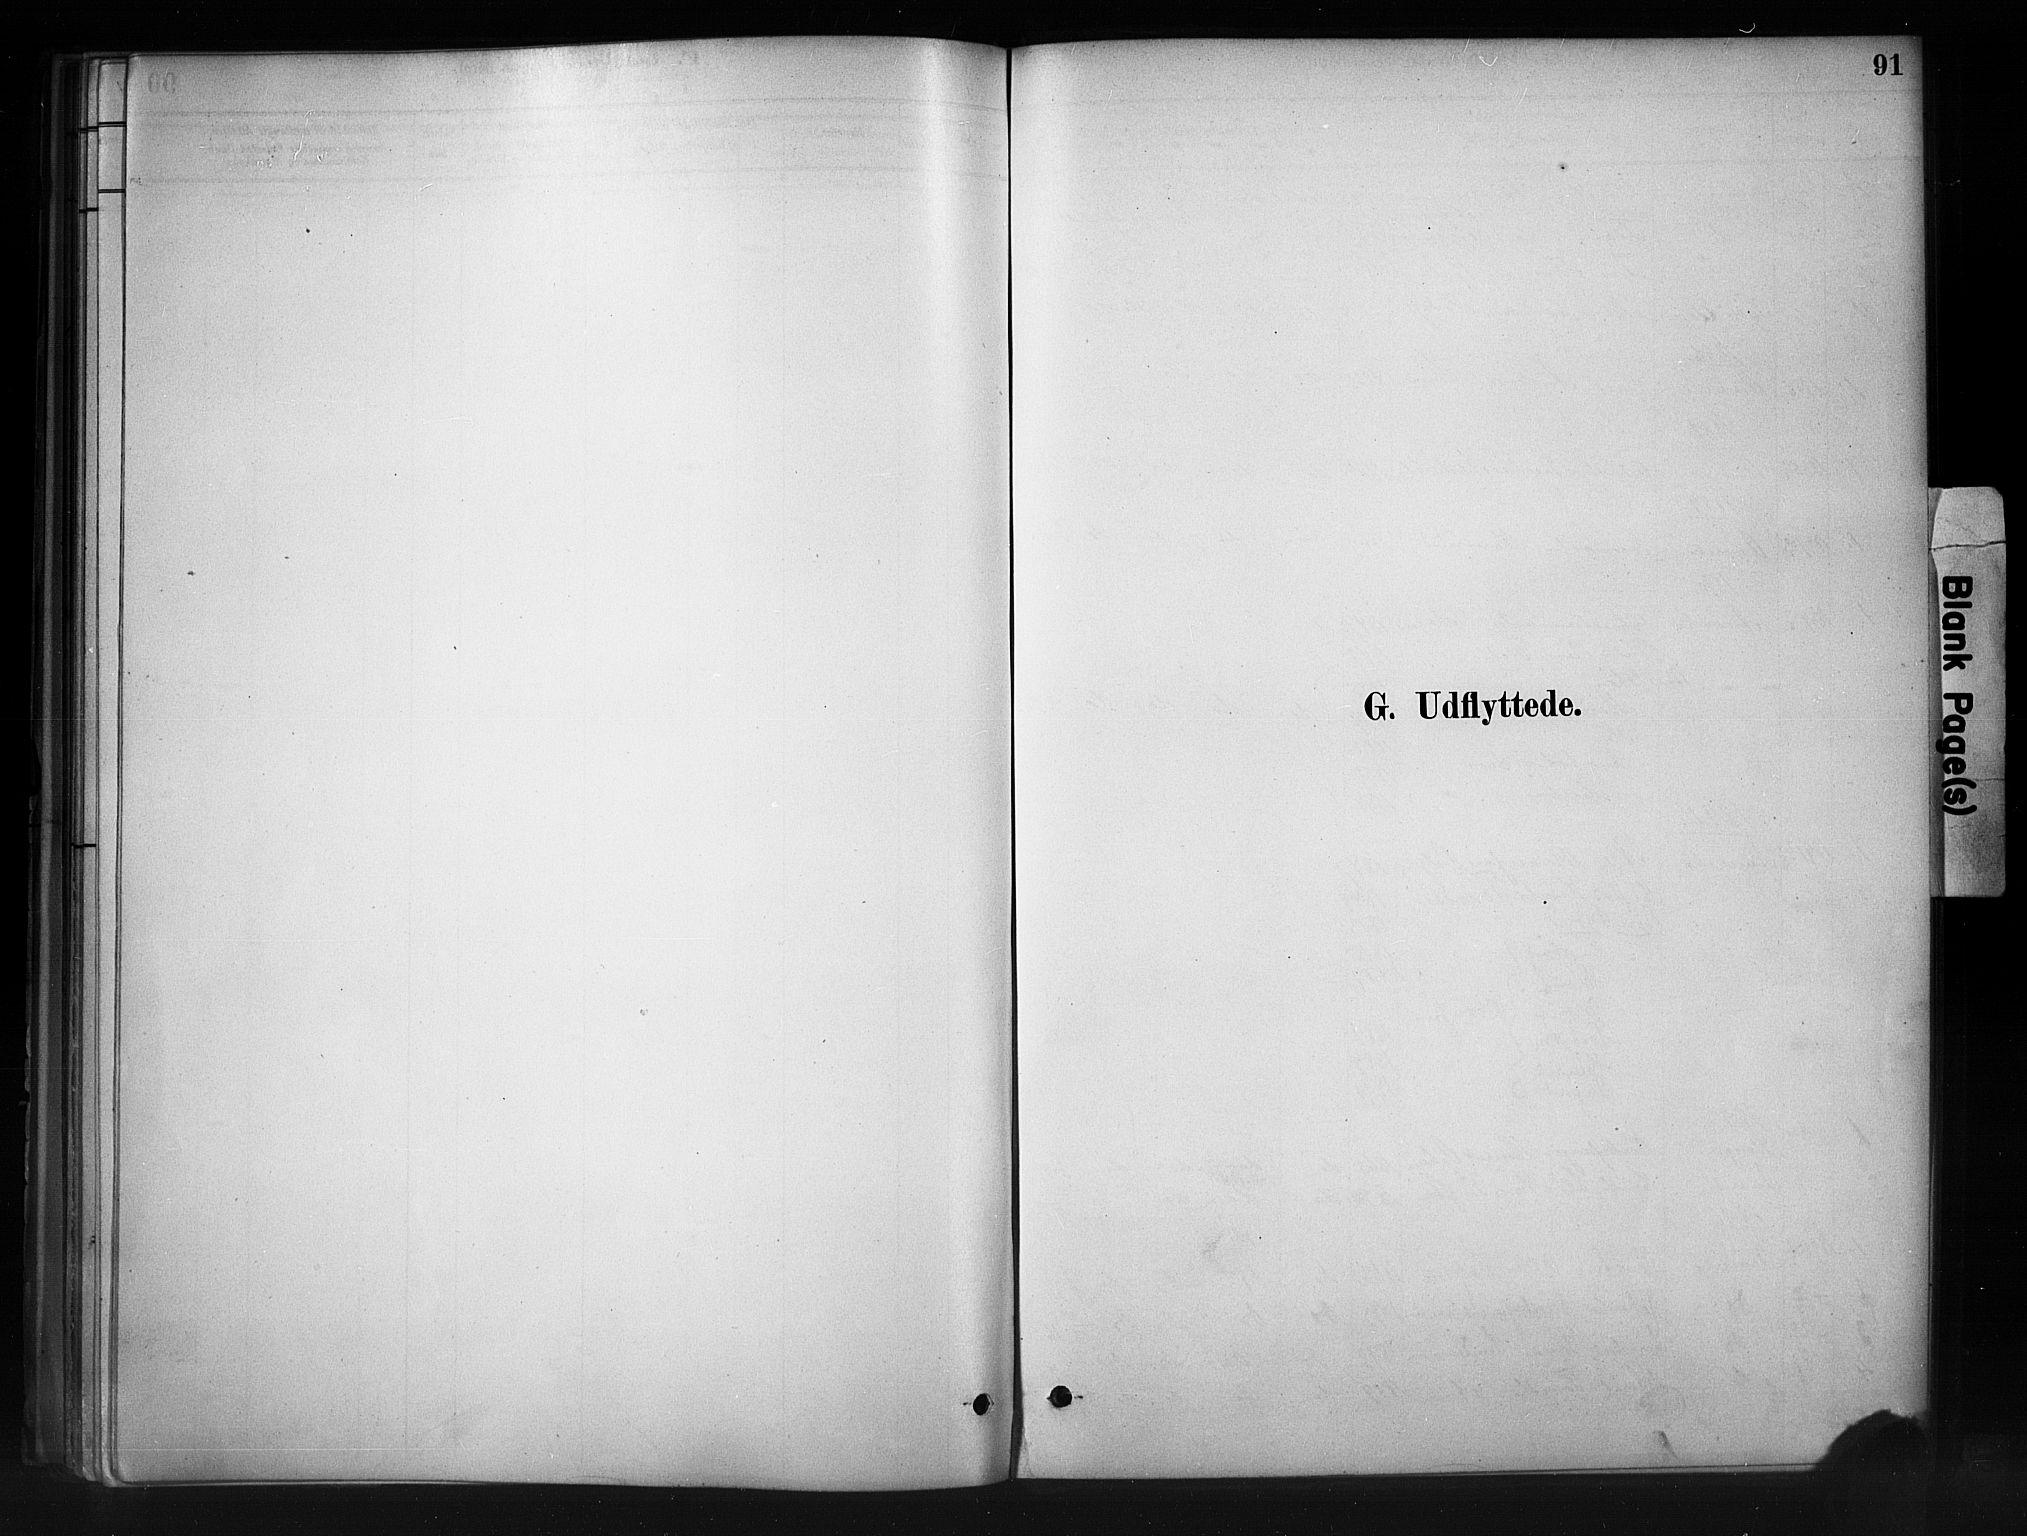 SAH, Nord-Aurdal prestekontor, Ministerialbok nr. 11, 1883-1896, s. 91